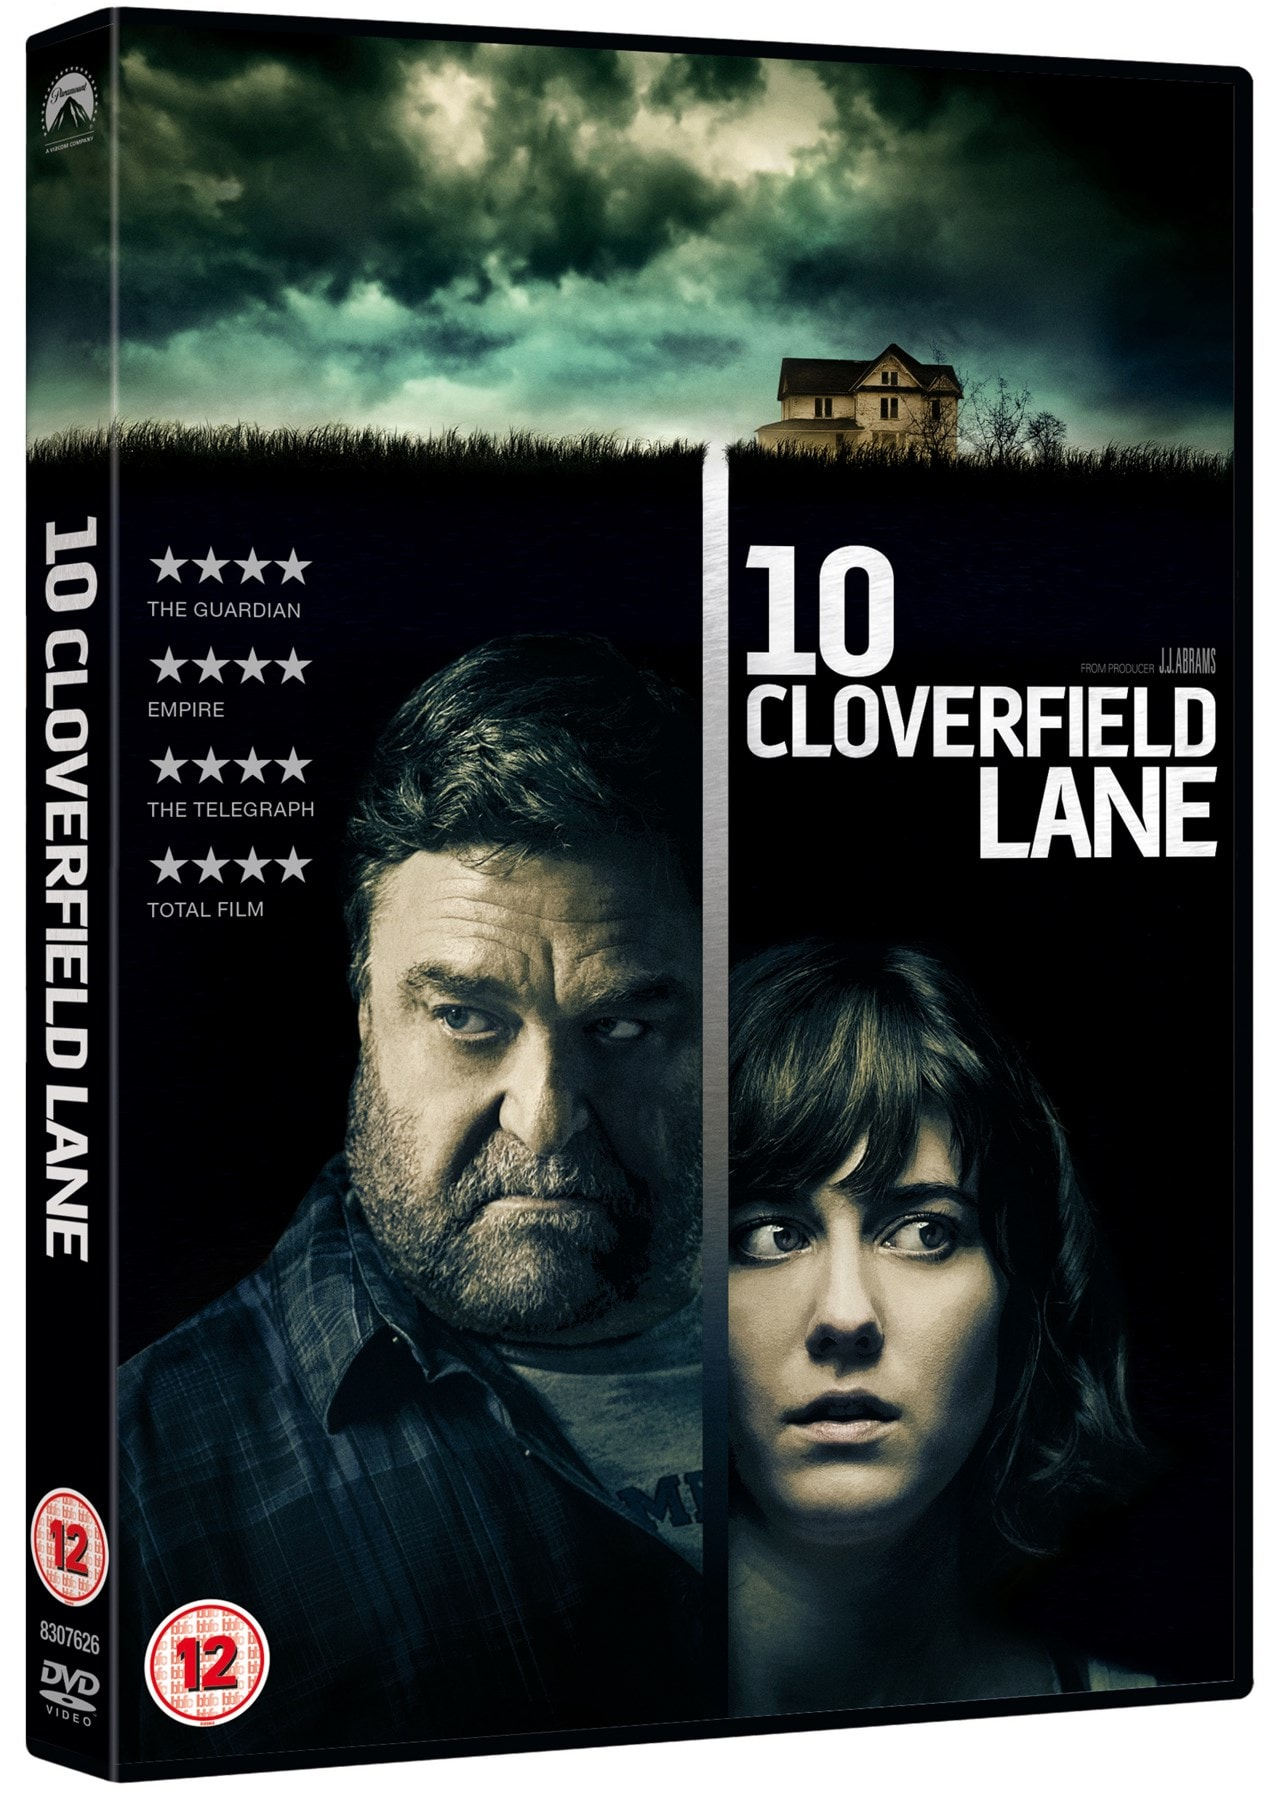 10 Cloverfield Lane - 2